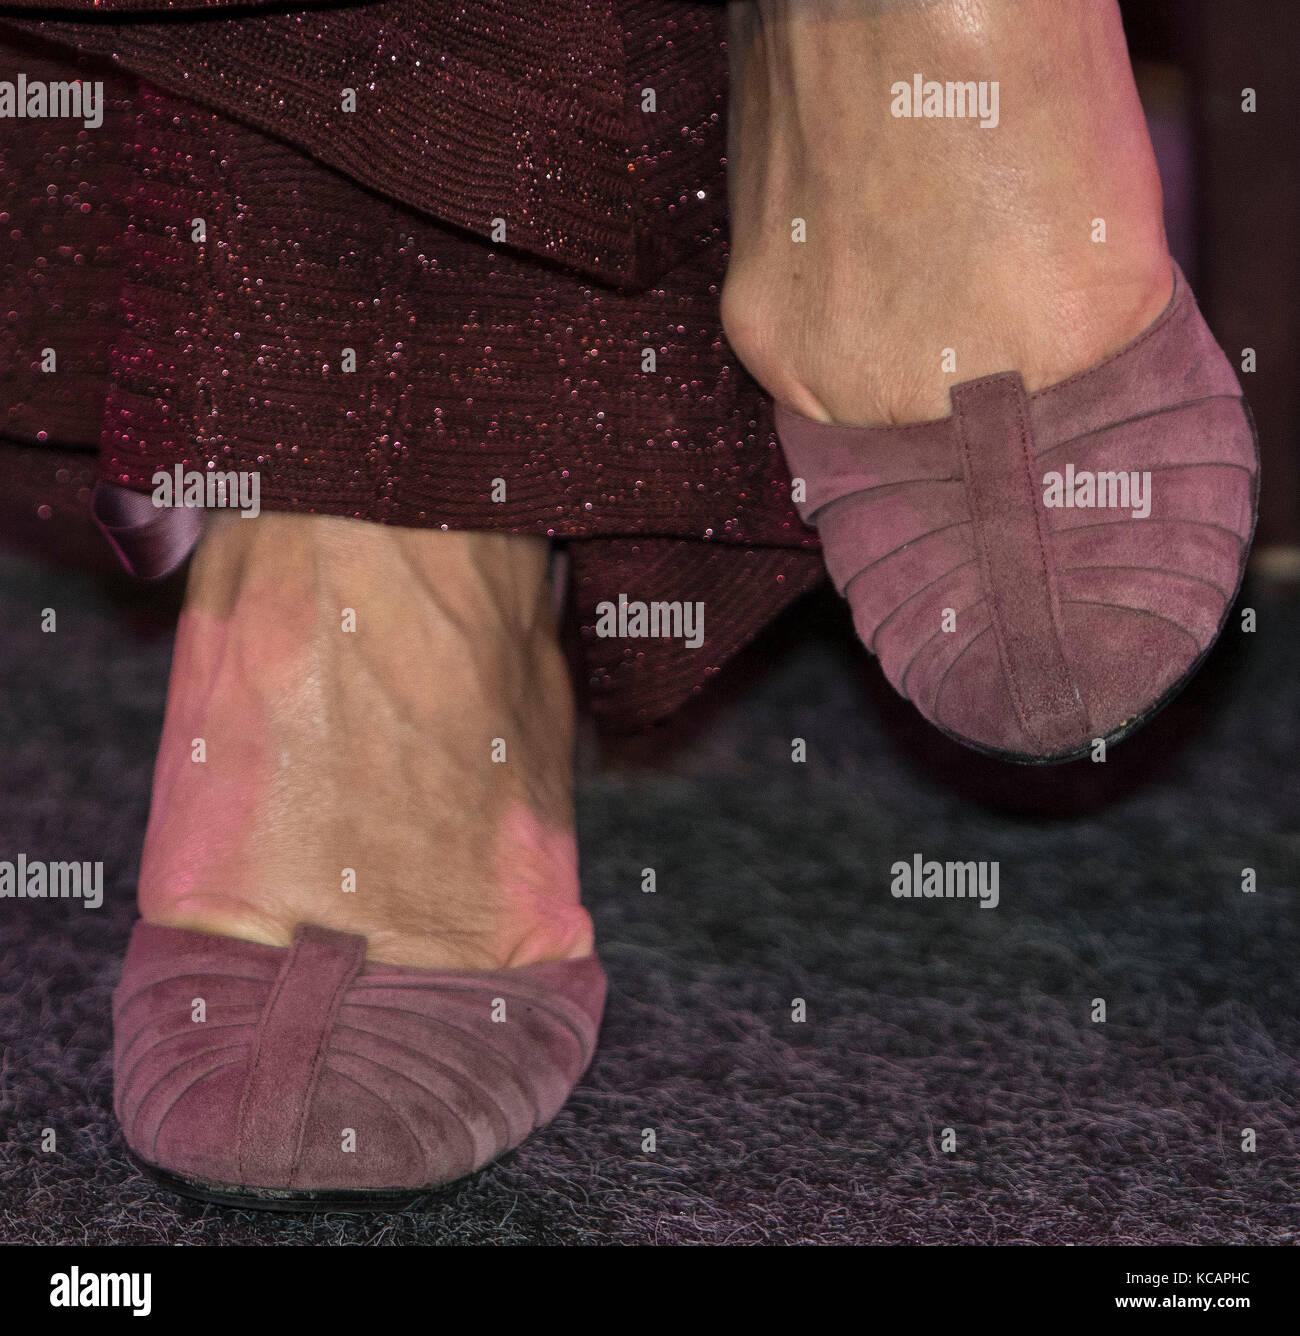 65e486cd838372 Stockfotos Alamy Bilder amp  Neuheit Schuhe Y4qf4a